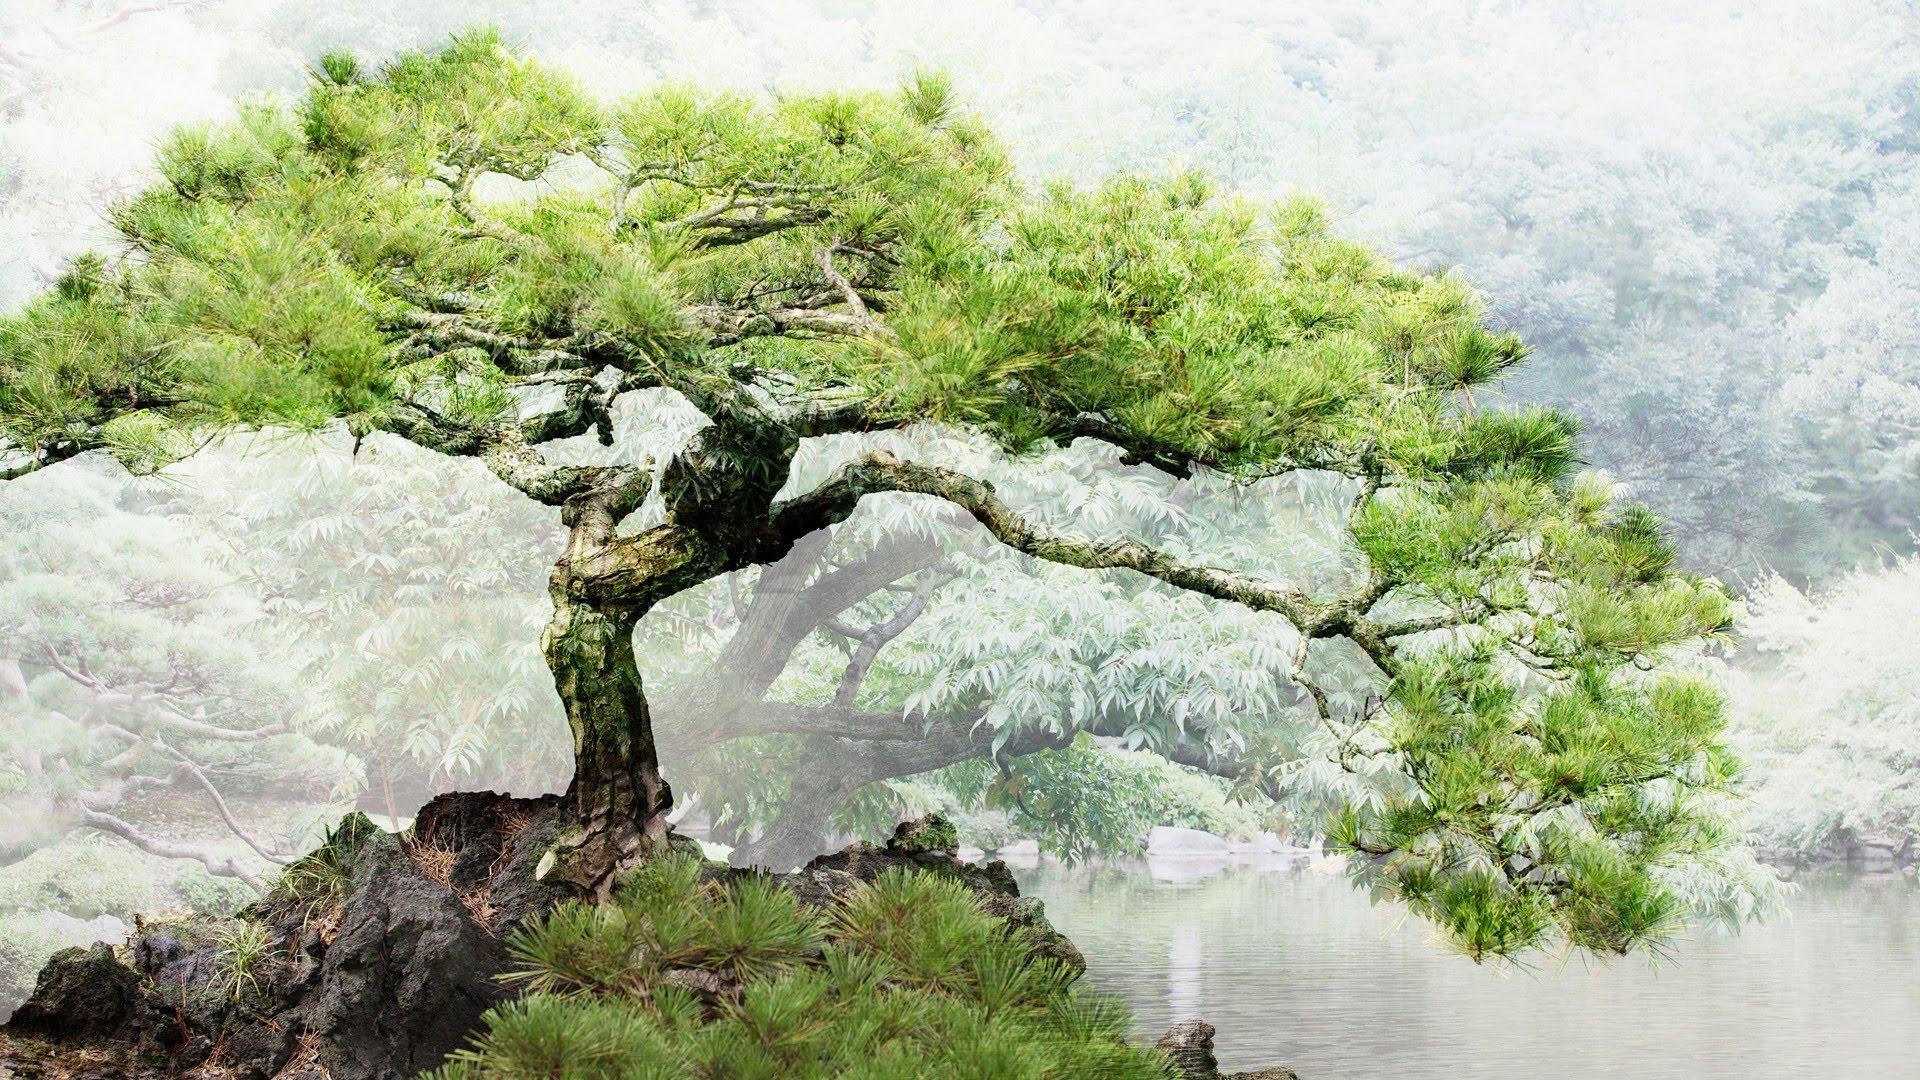 Wallpapers With Inspirational Quotes Free Download Bonsai Tree Wallpaper For Desktop Pixelstalk Net